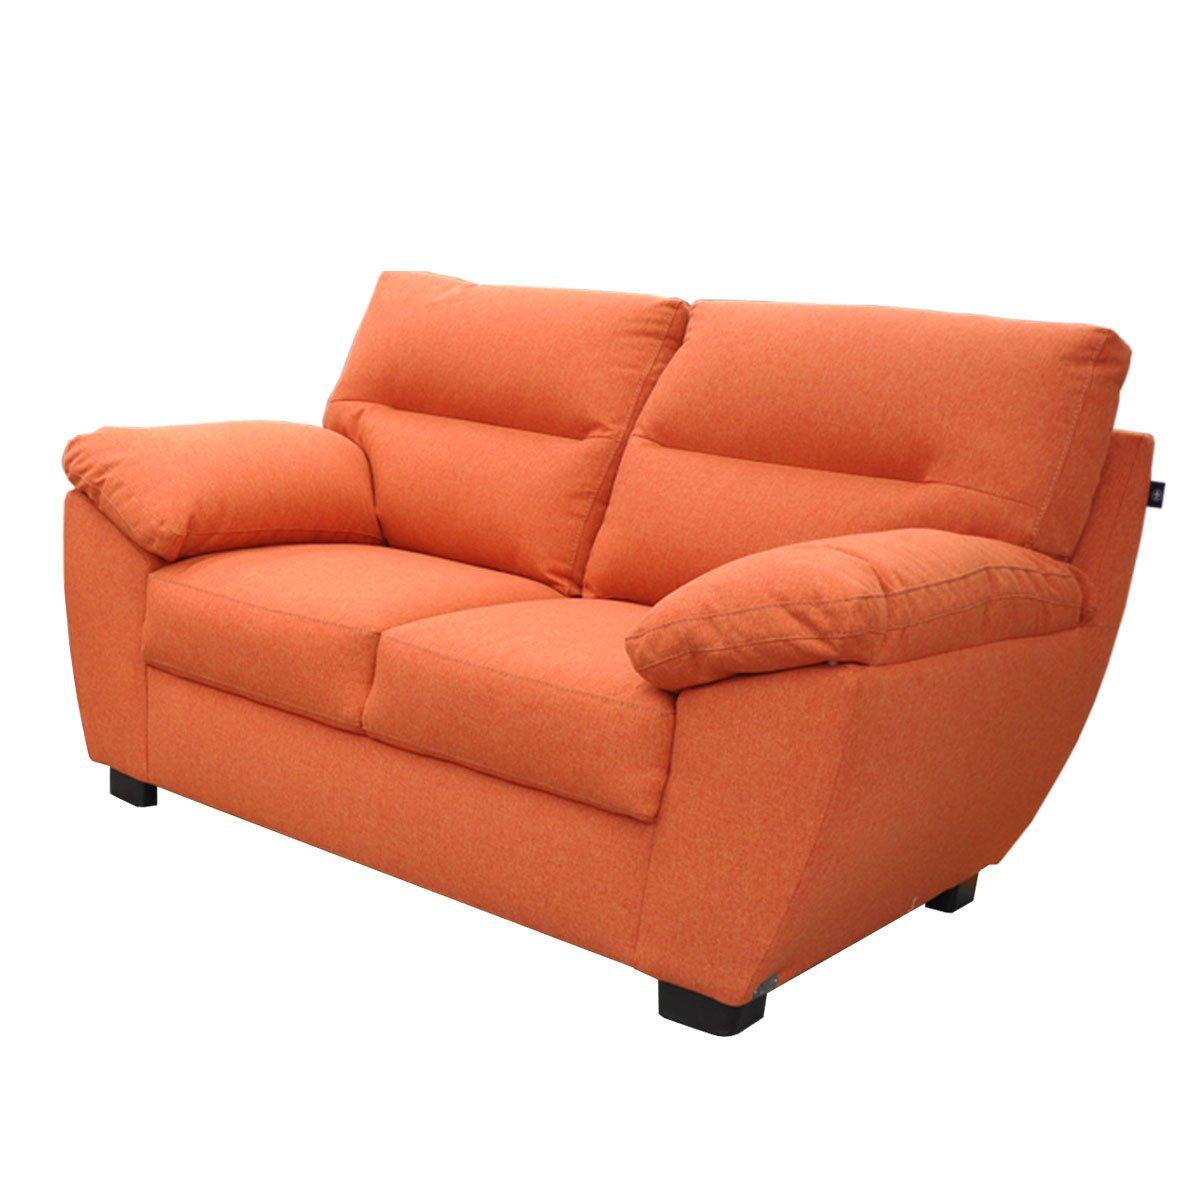 Love Seat Oxnard Tapiz Tela Naranja Muebles Liz Sears Com Mx  # Muebles Liz Sears